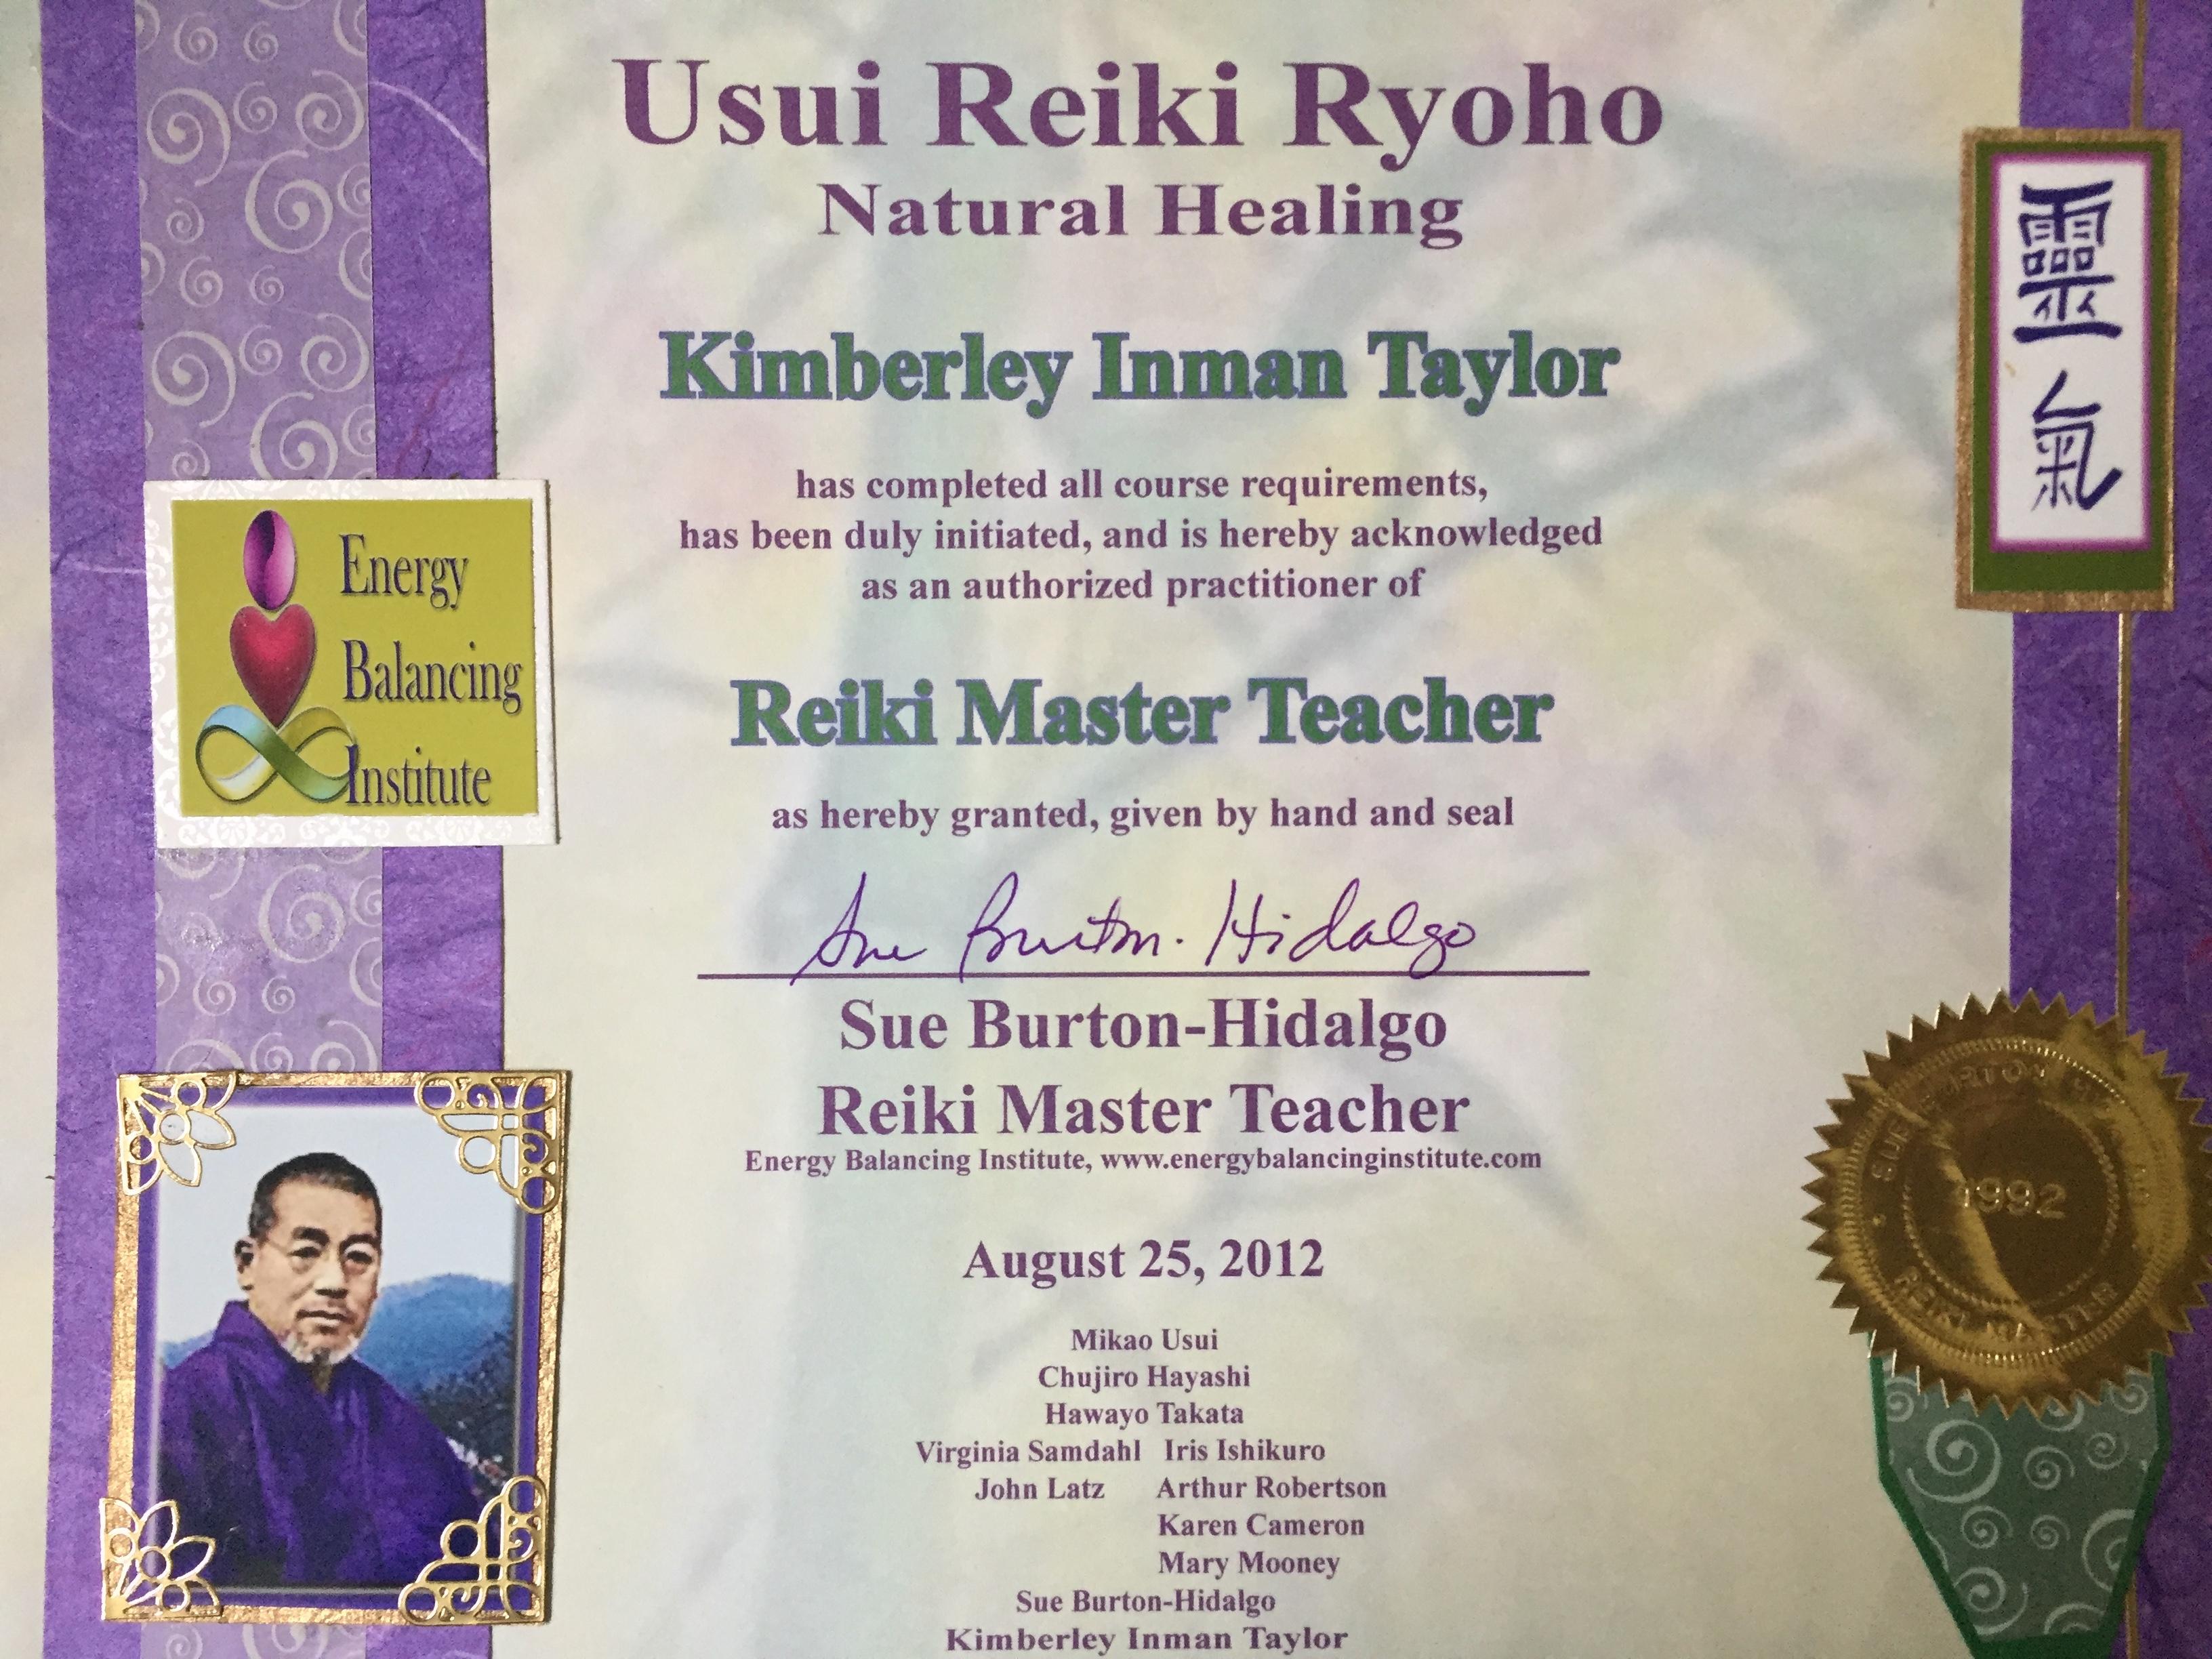 Usui Reiki Ryoho Master Teacher